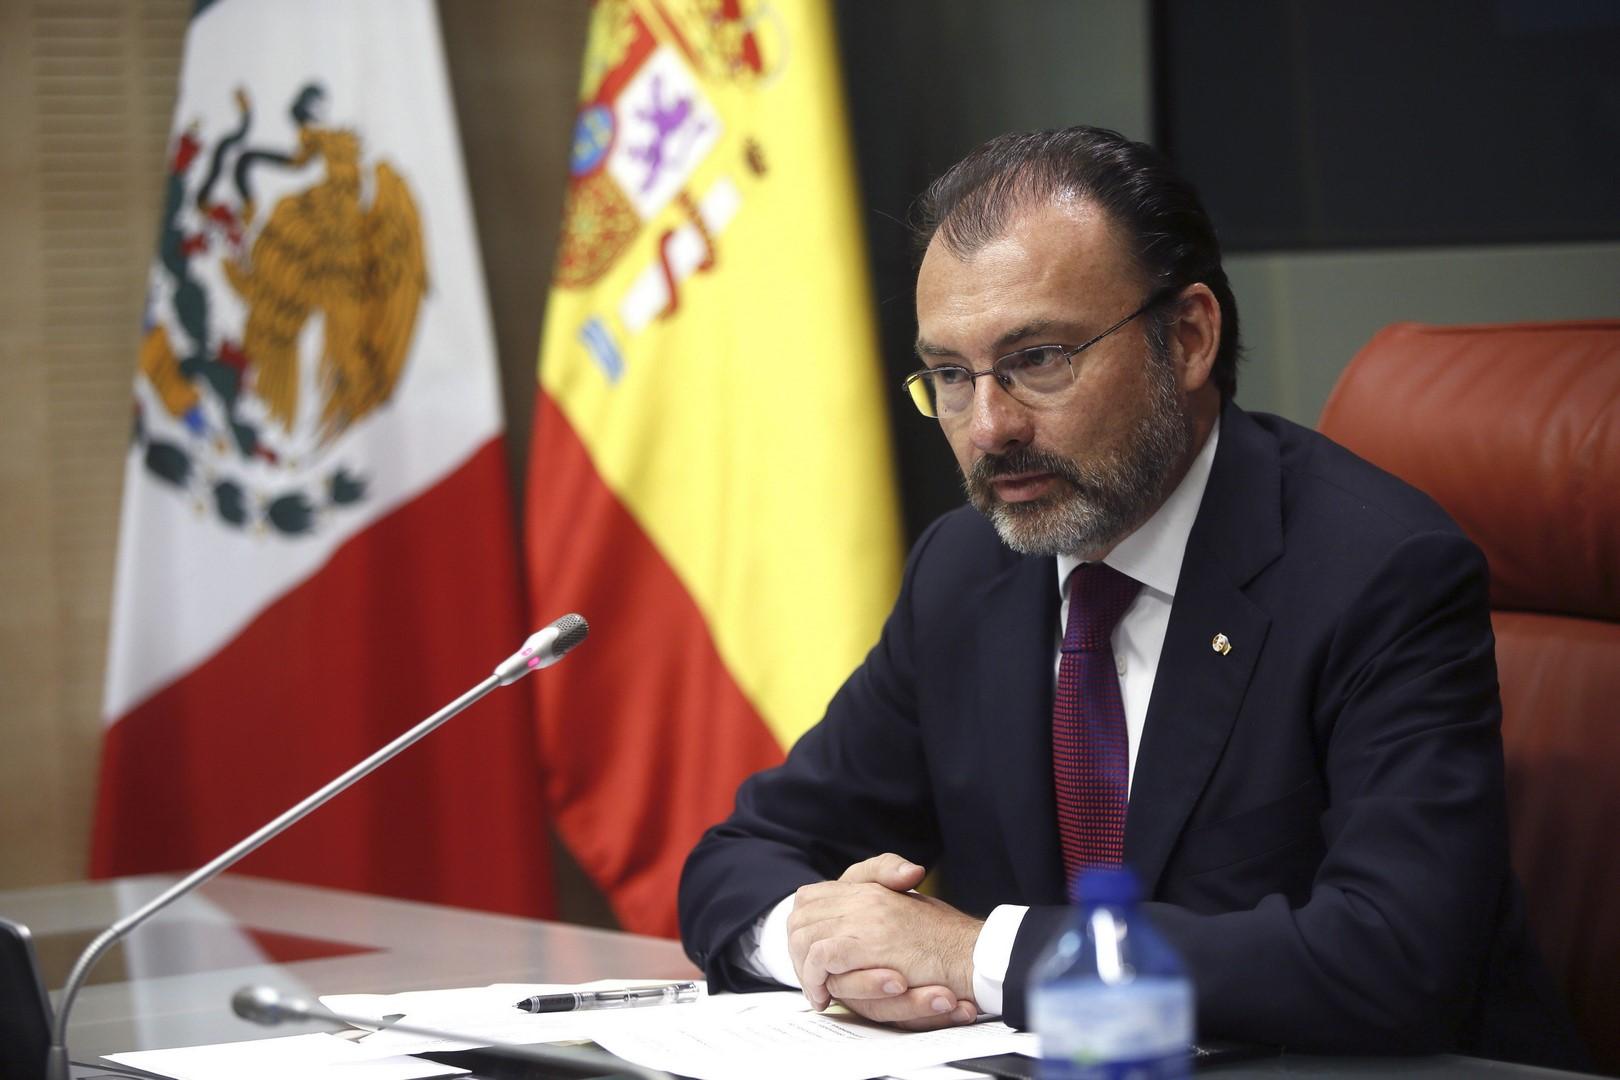 Exige Videgaray a EU respetar derecho de deportados 20/Abr/2017 Nacional